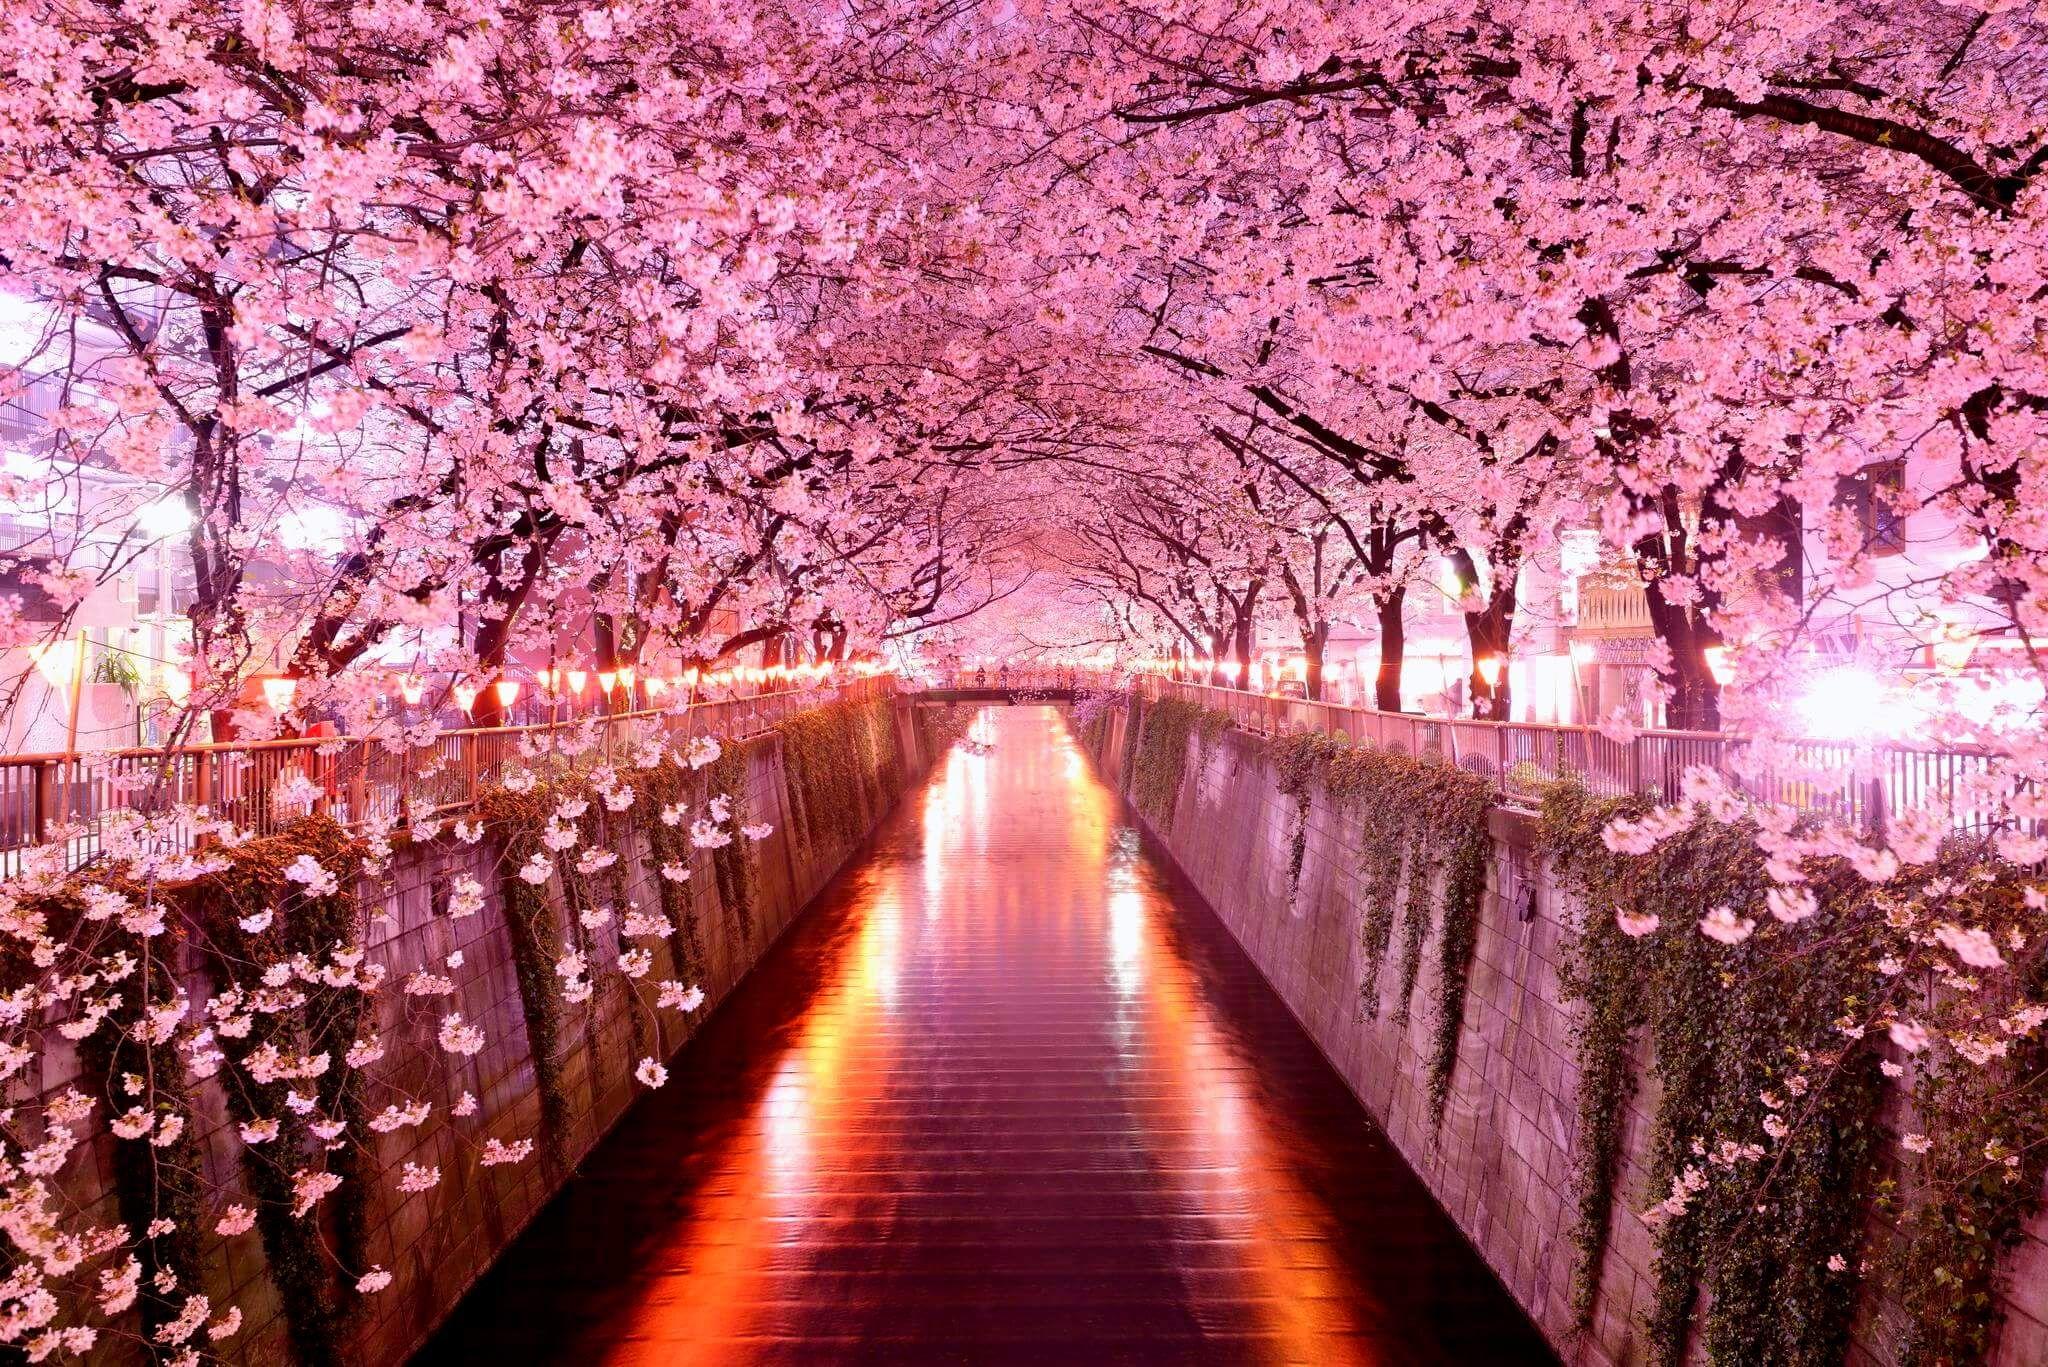 Japan S Cherry Blossoms Wisteria Tree Cherry Blossom Wallpaper Tree Tunnel